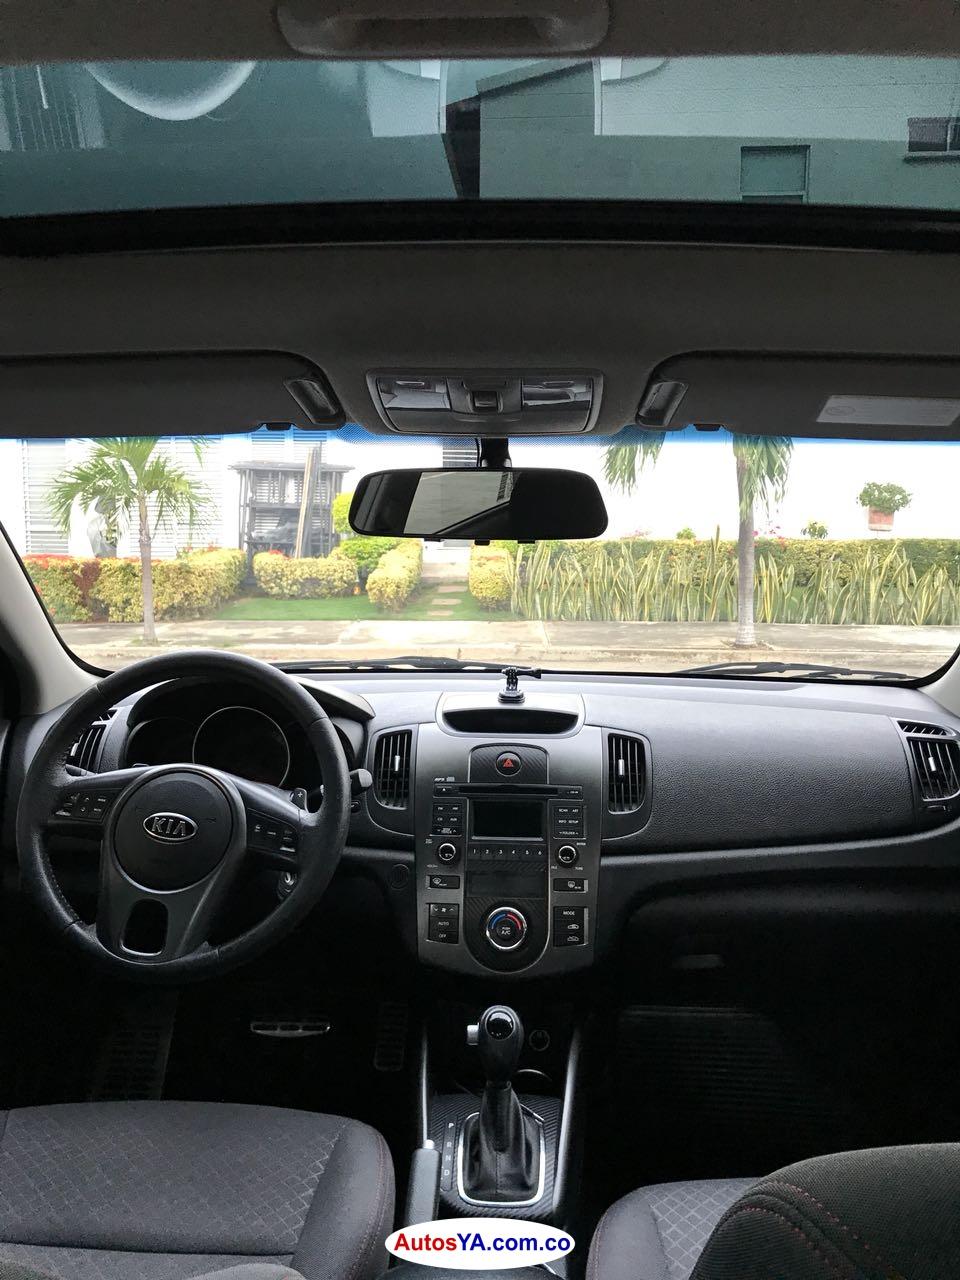 kiacerato2013automatico90.000kms$342.0n